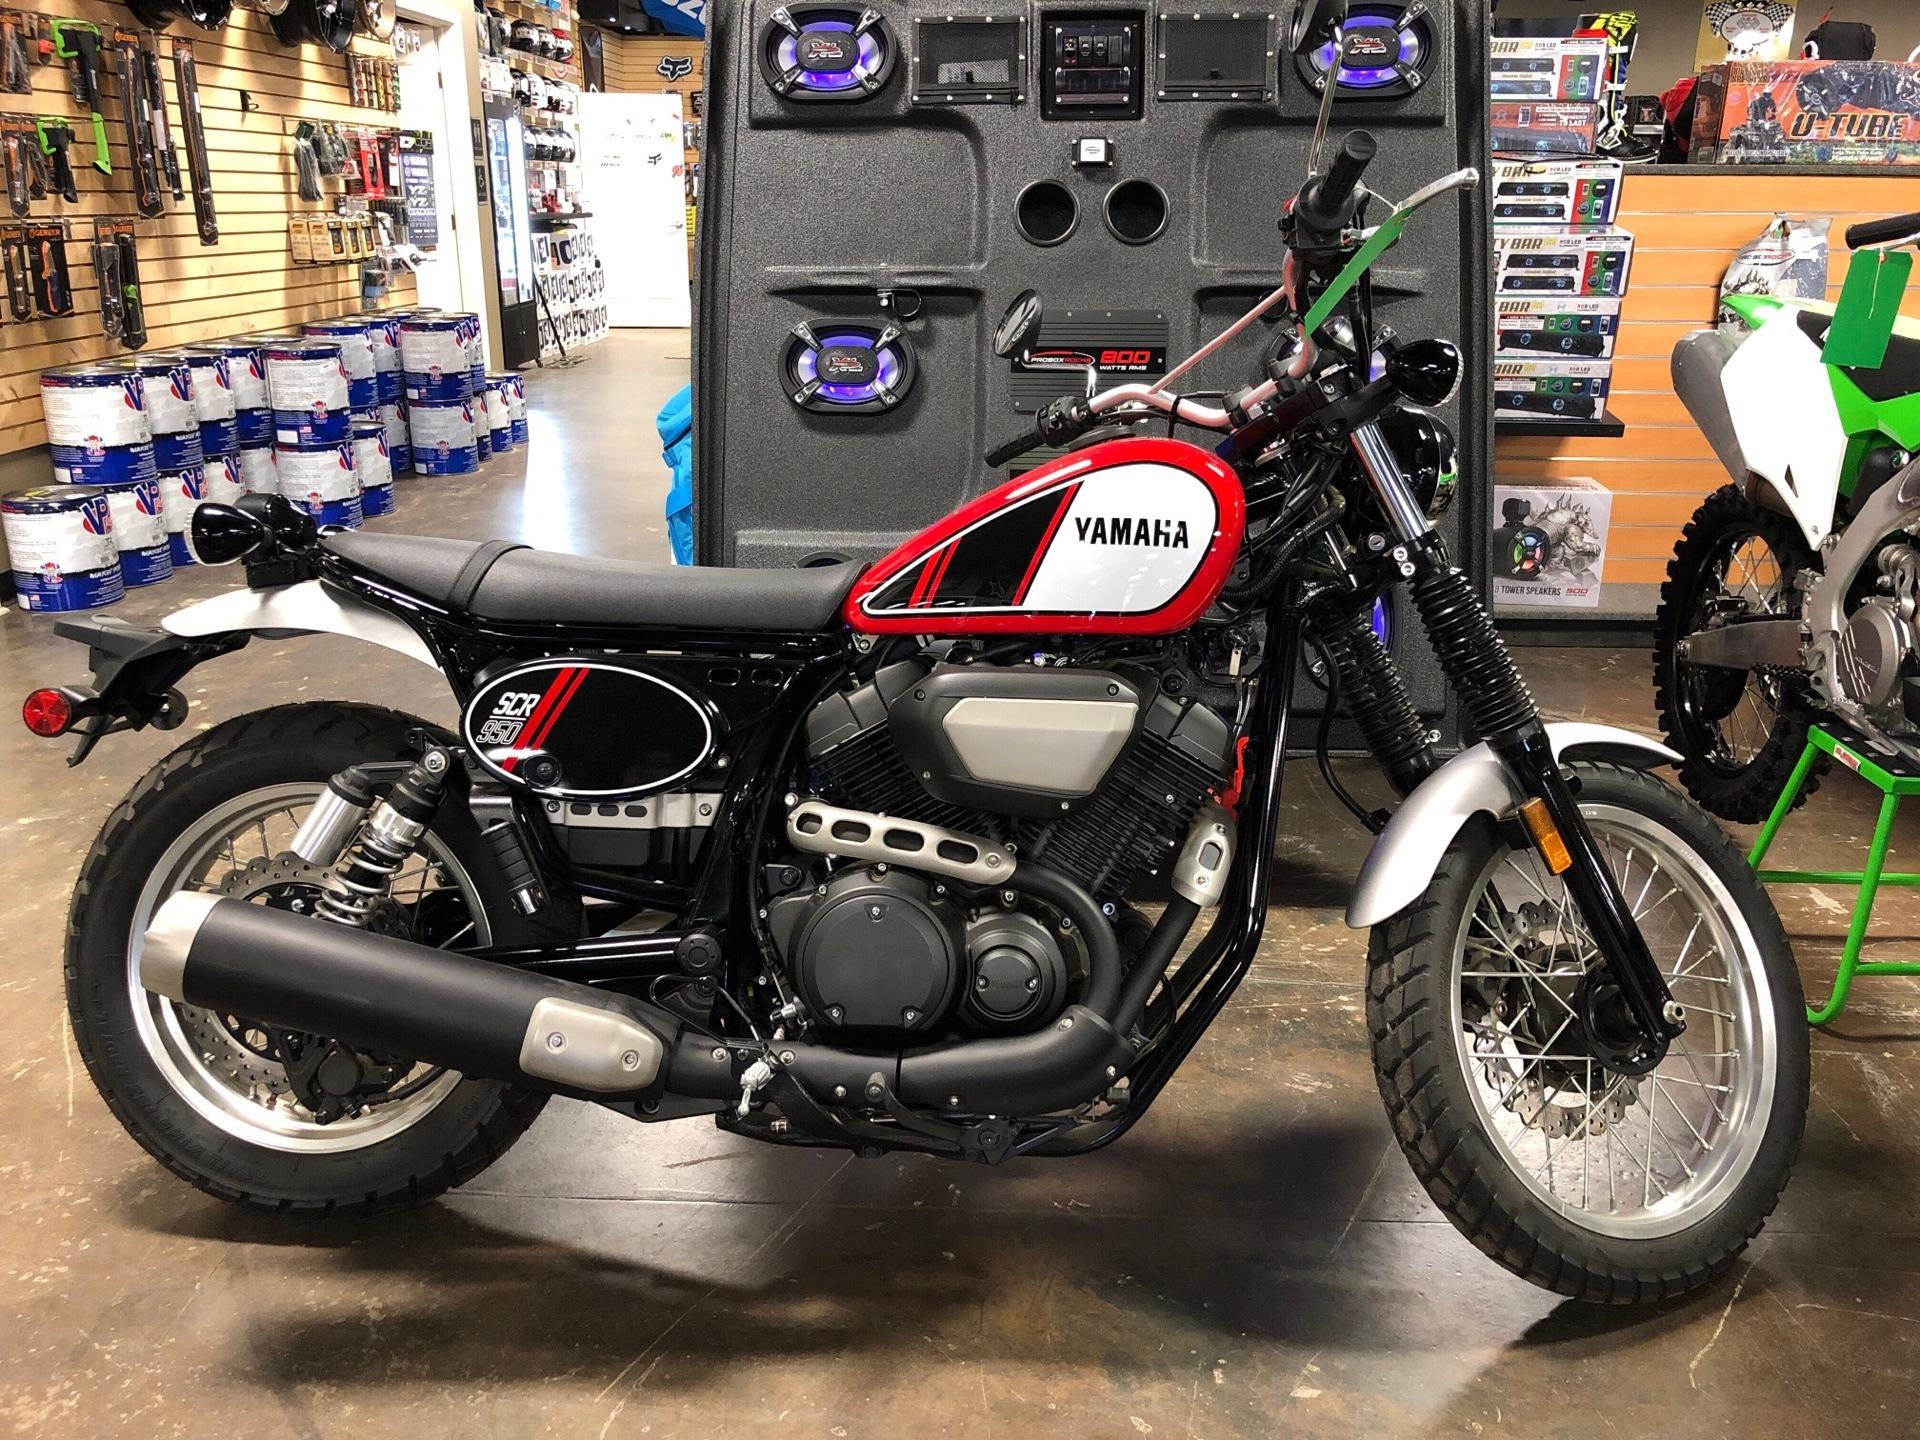 2017 Yamaha Scr950 In Tyler Texas Photo 1